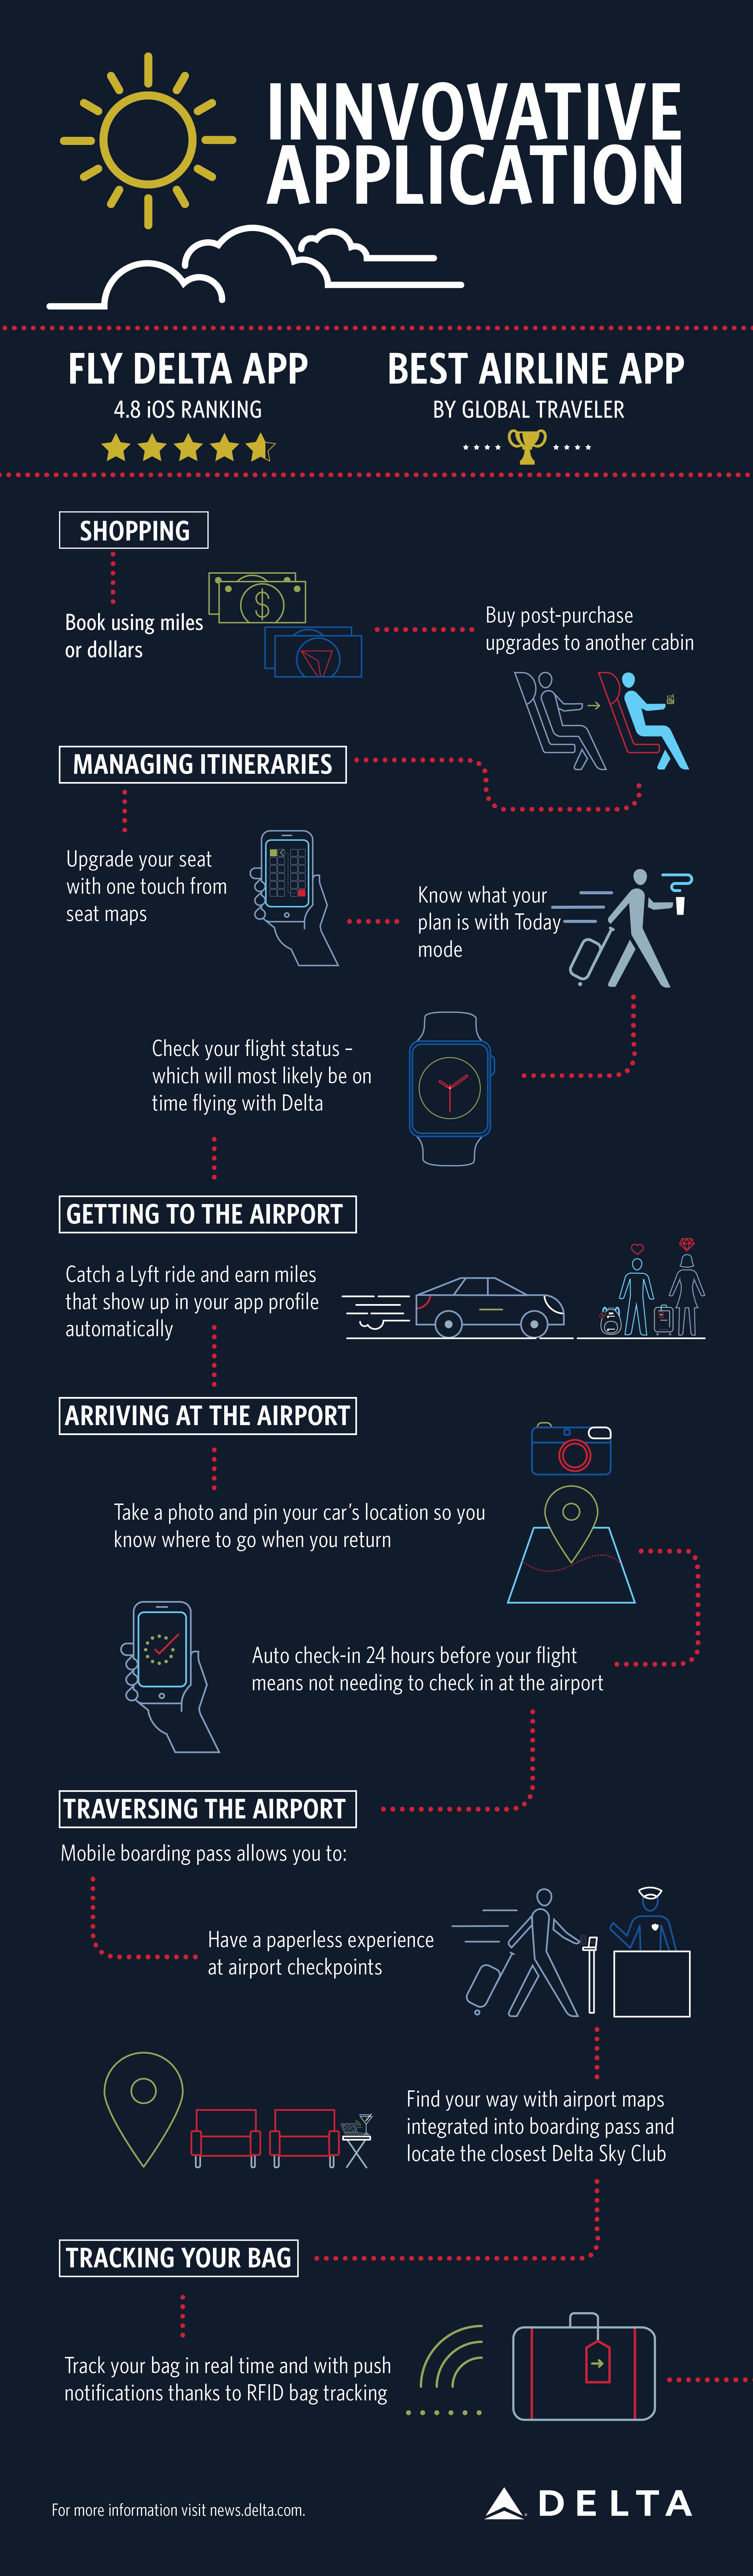 Fly Delta App Travel Journey